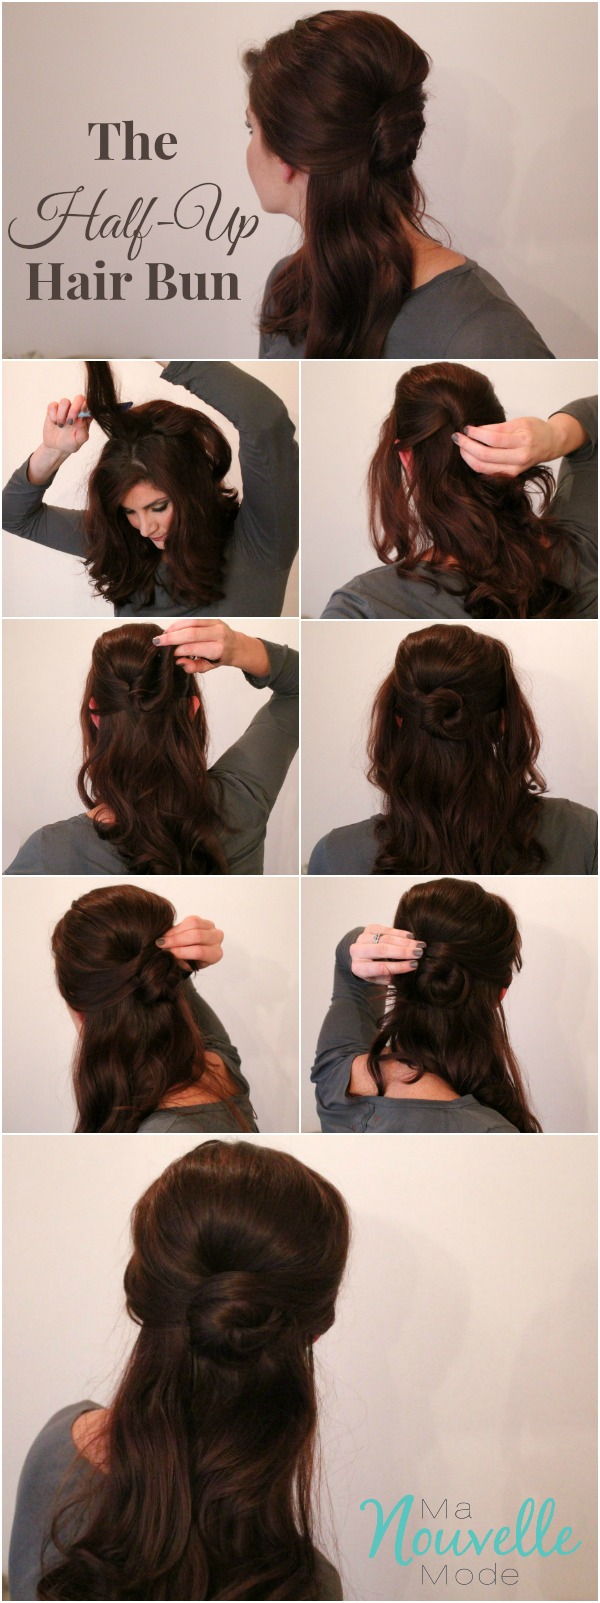 Half-Up-hair-bun